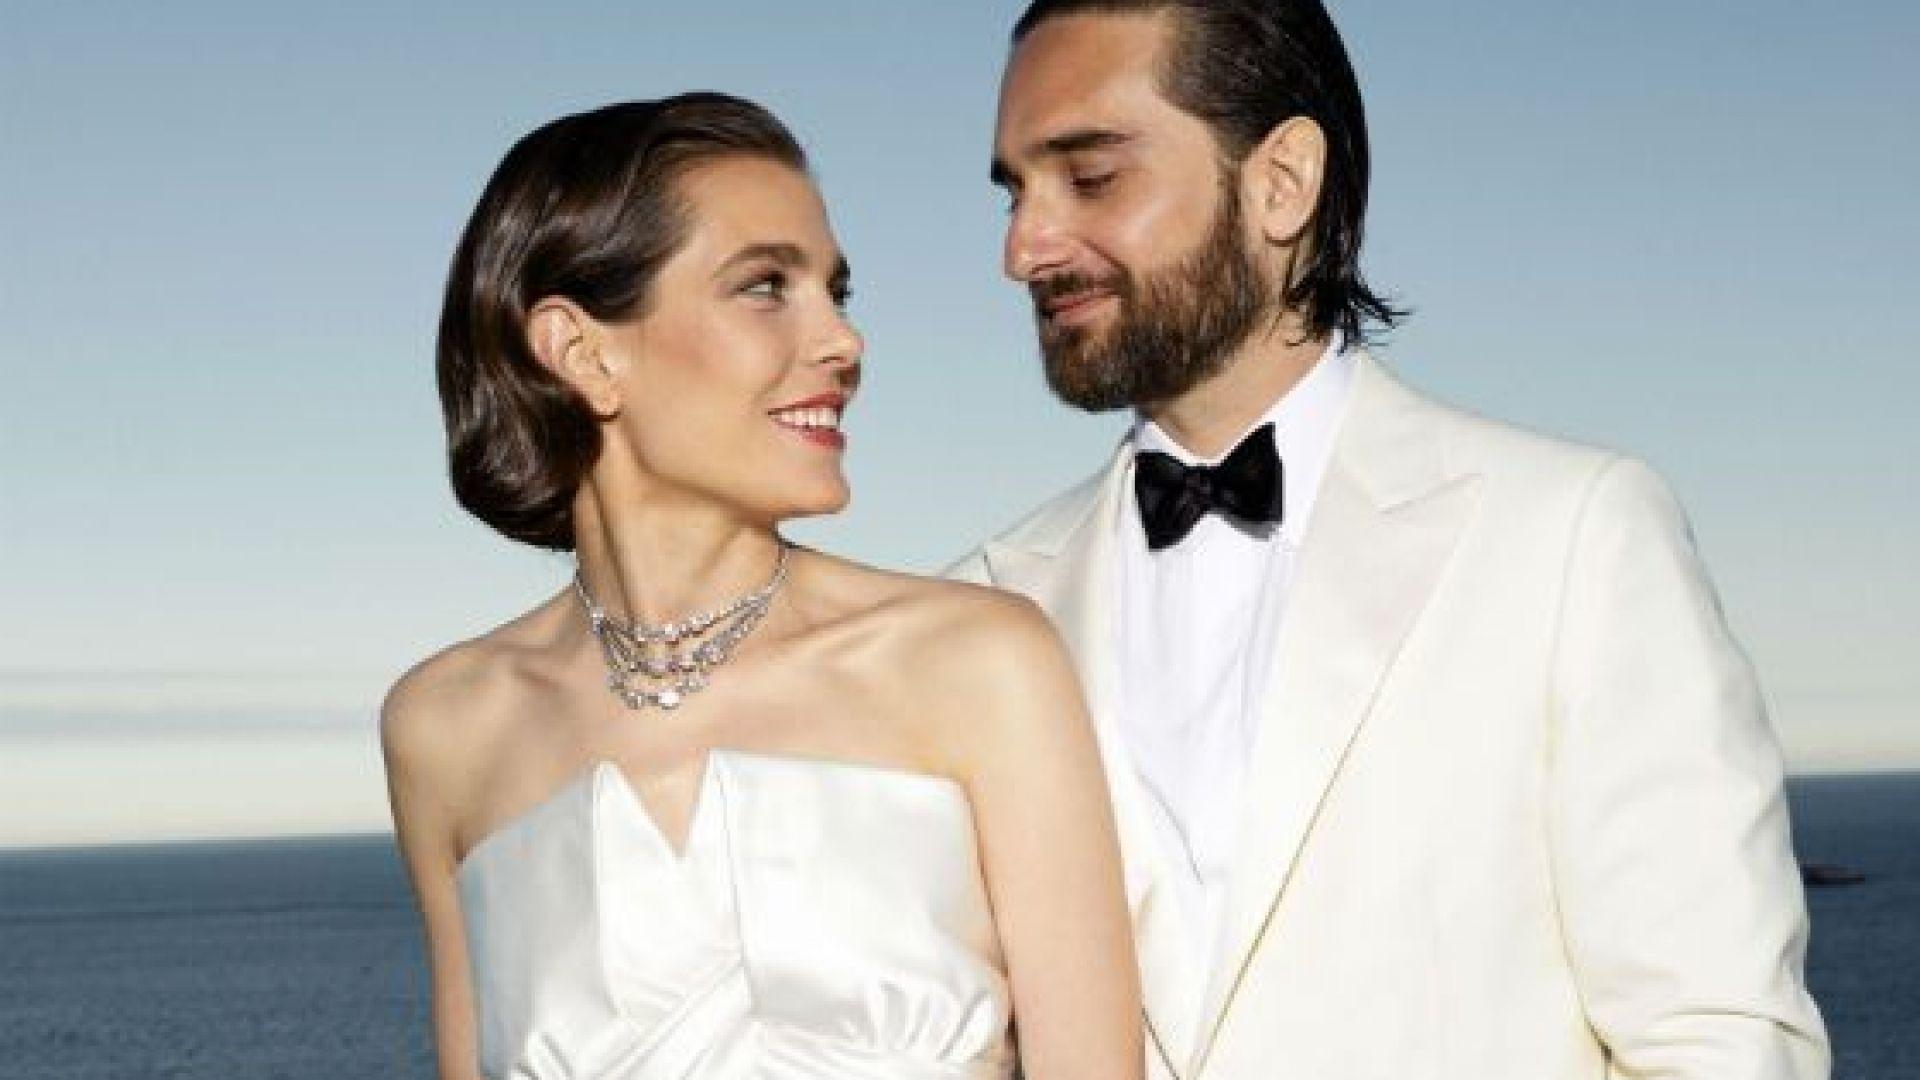 Шарлот Казираги се омъжи в изчистена рокля за Димитри Расам